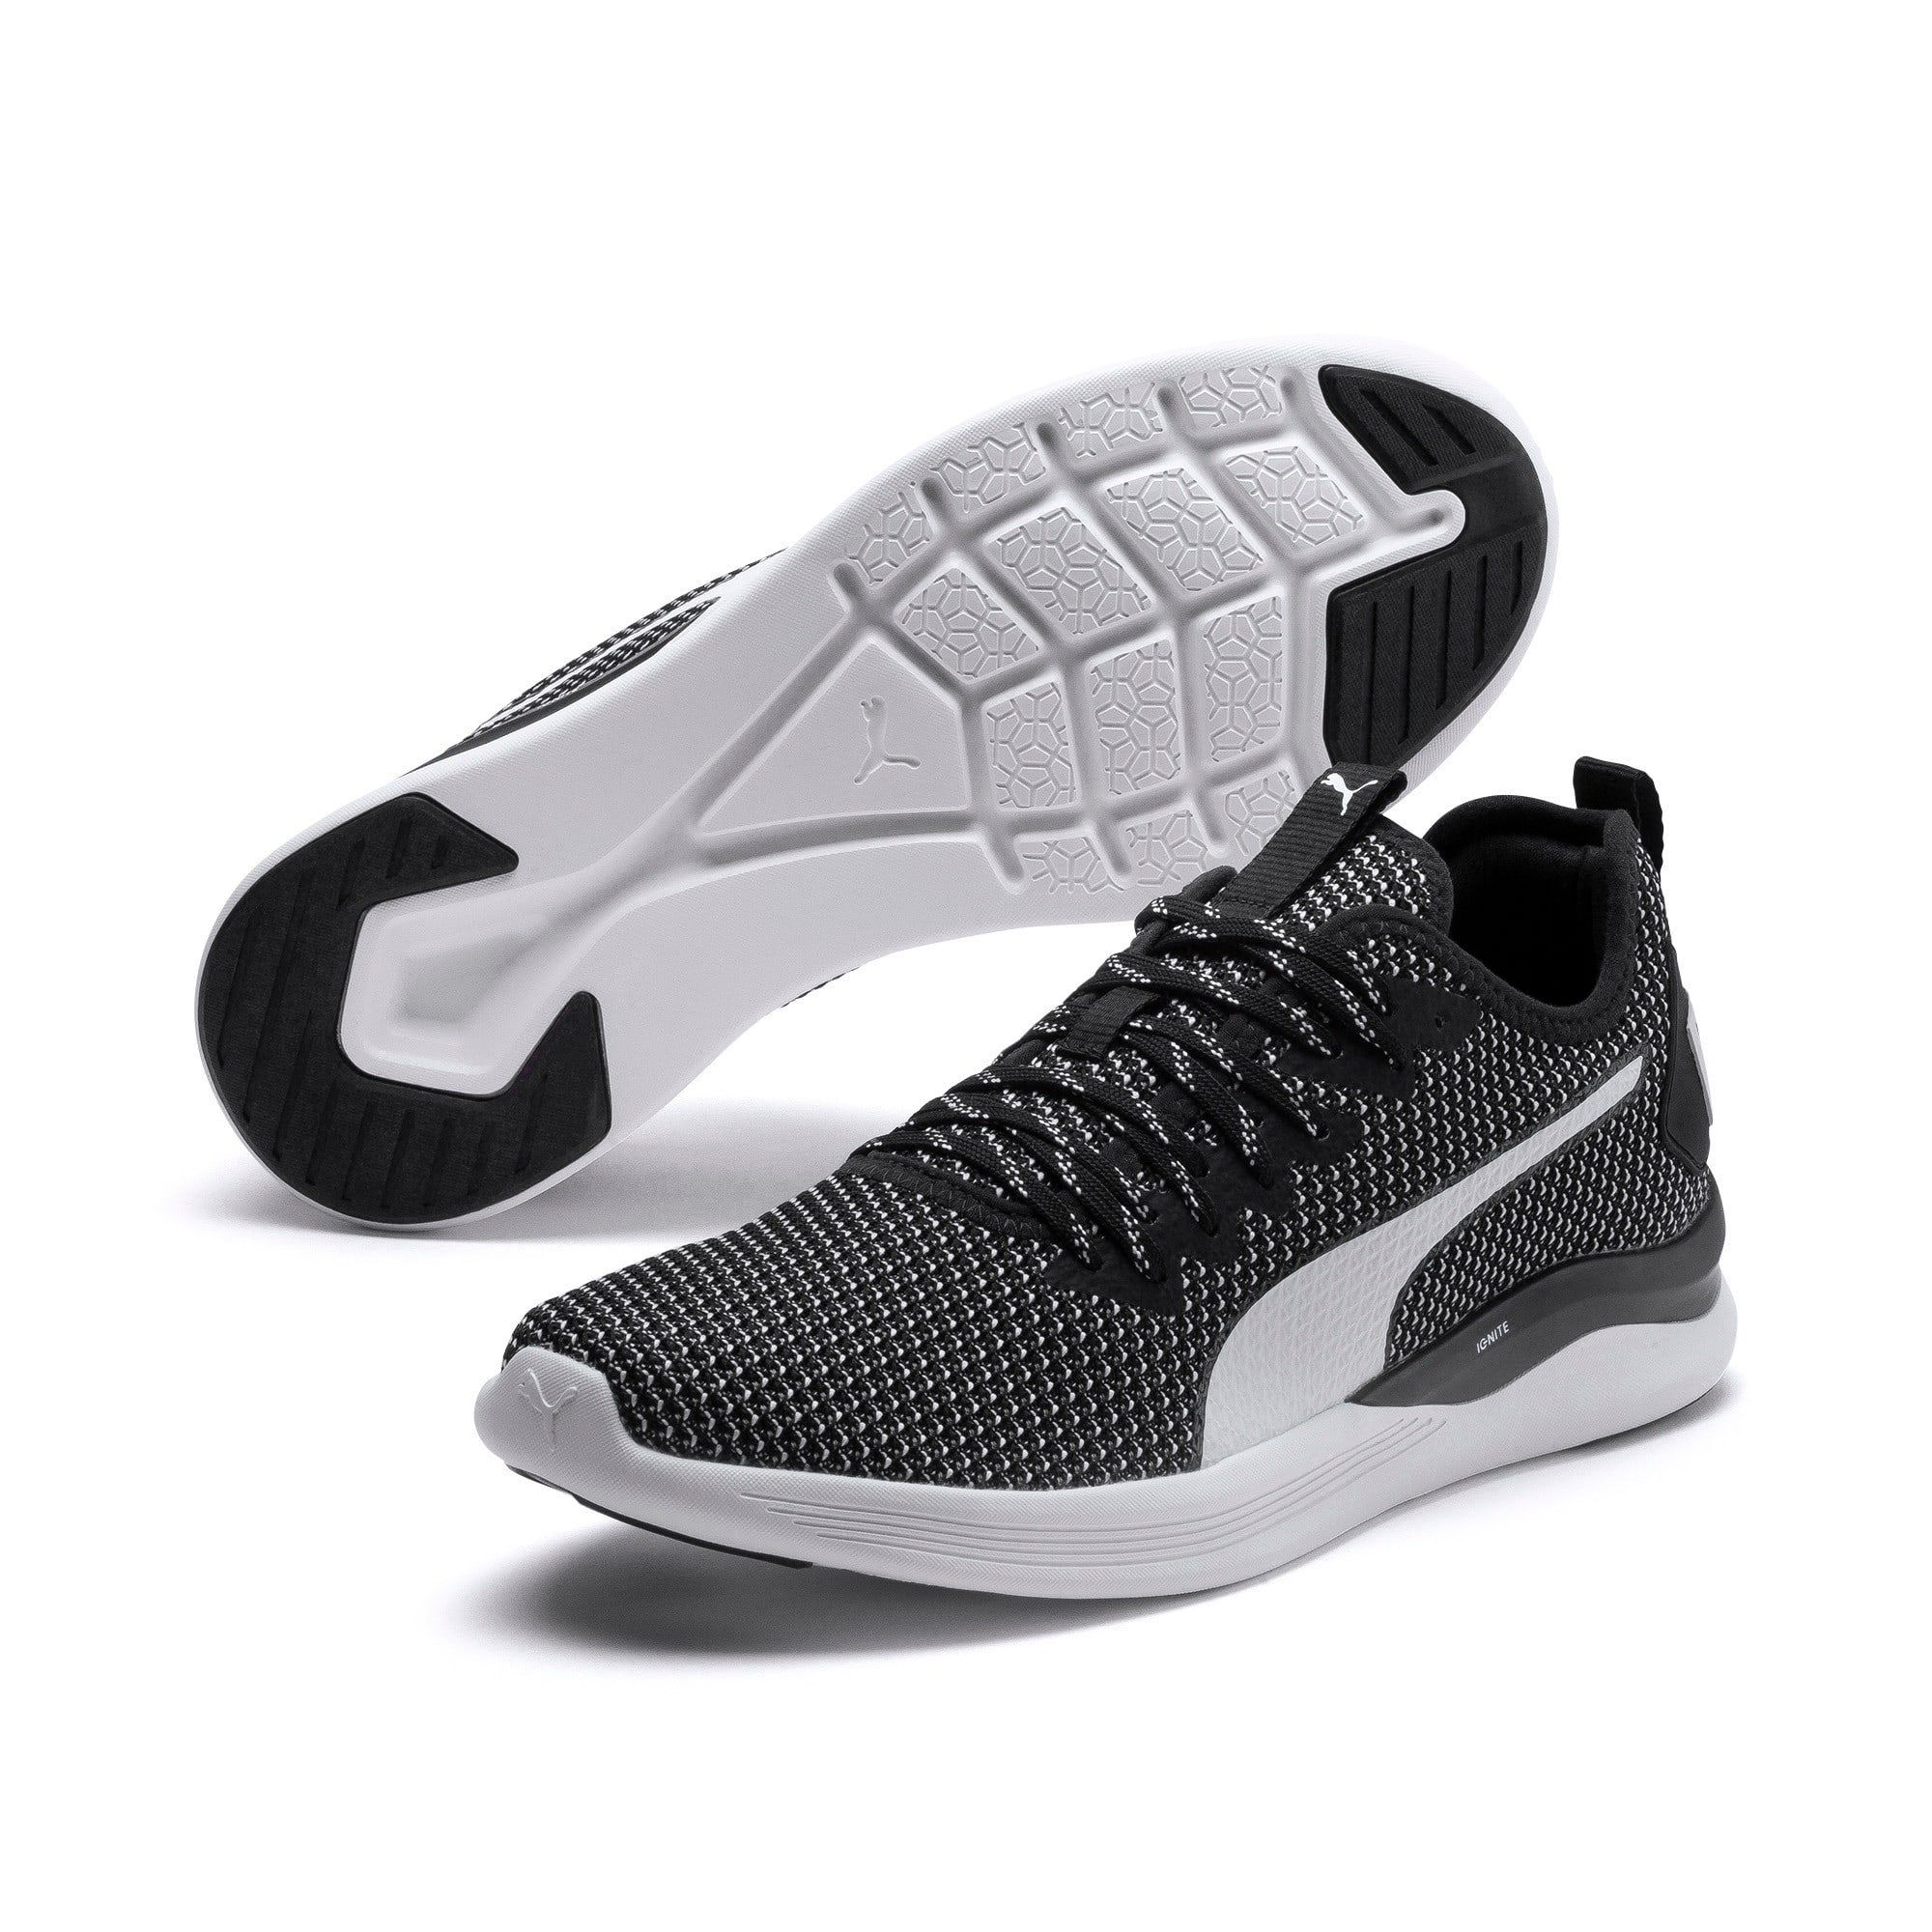 chaussures pour homme puma